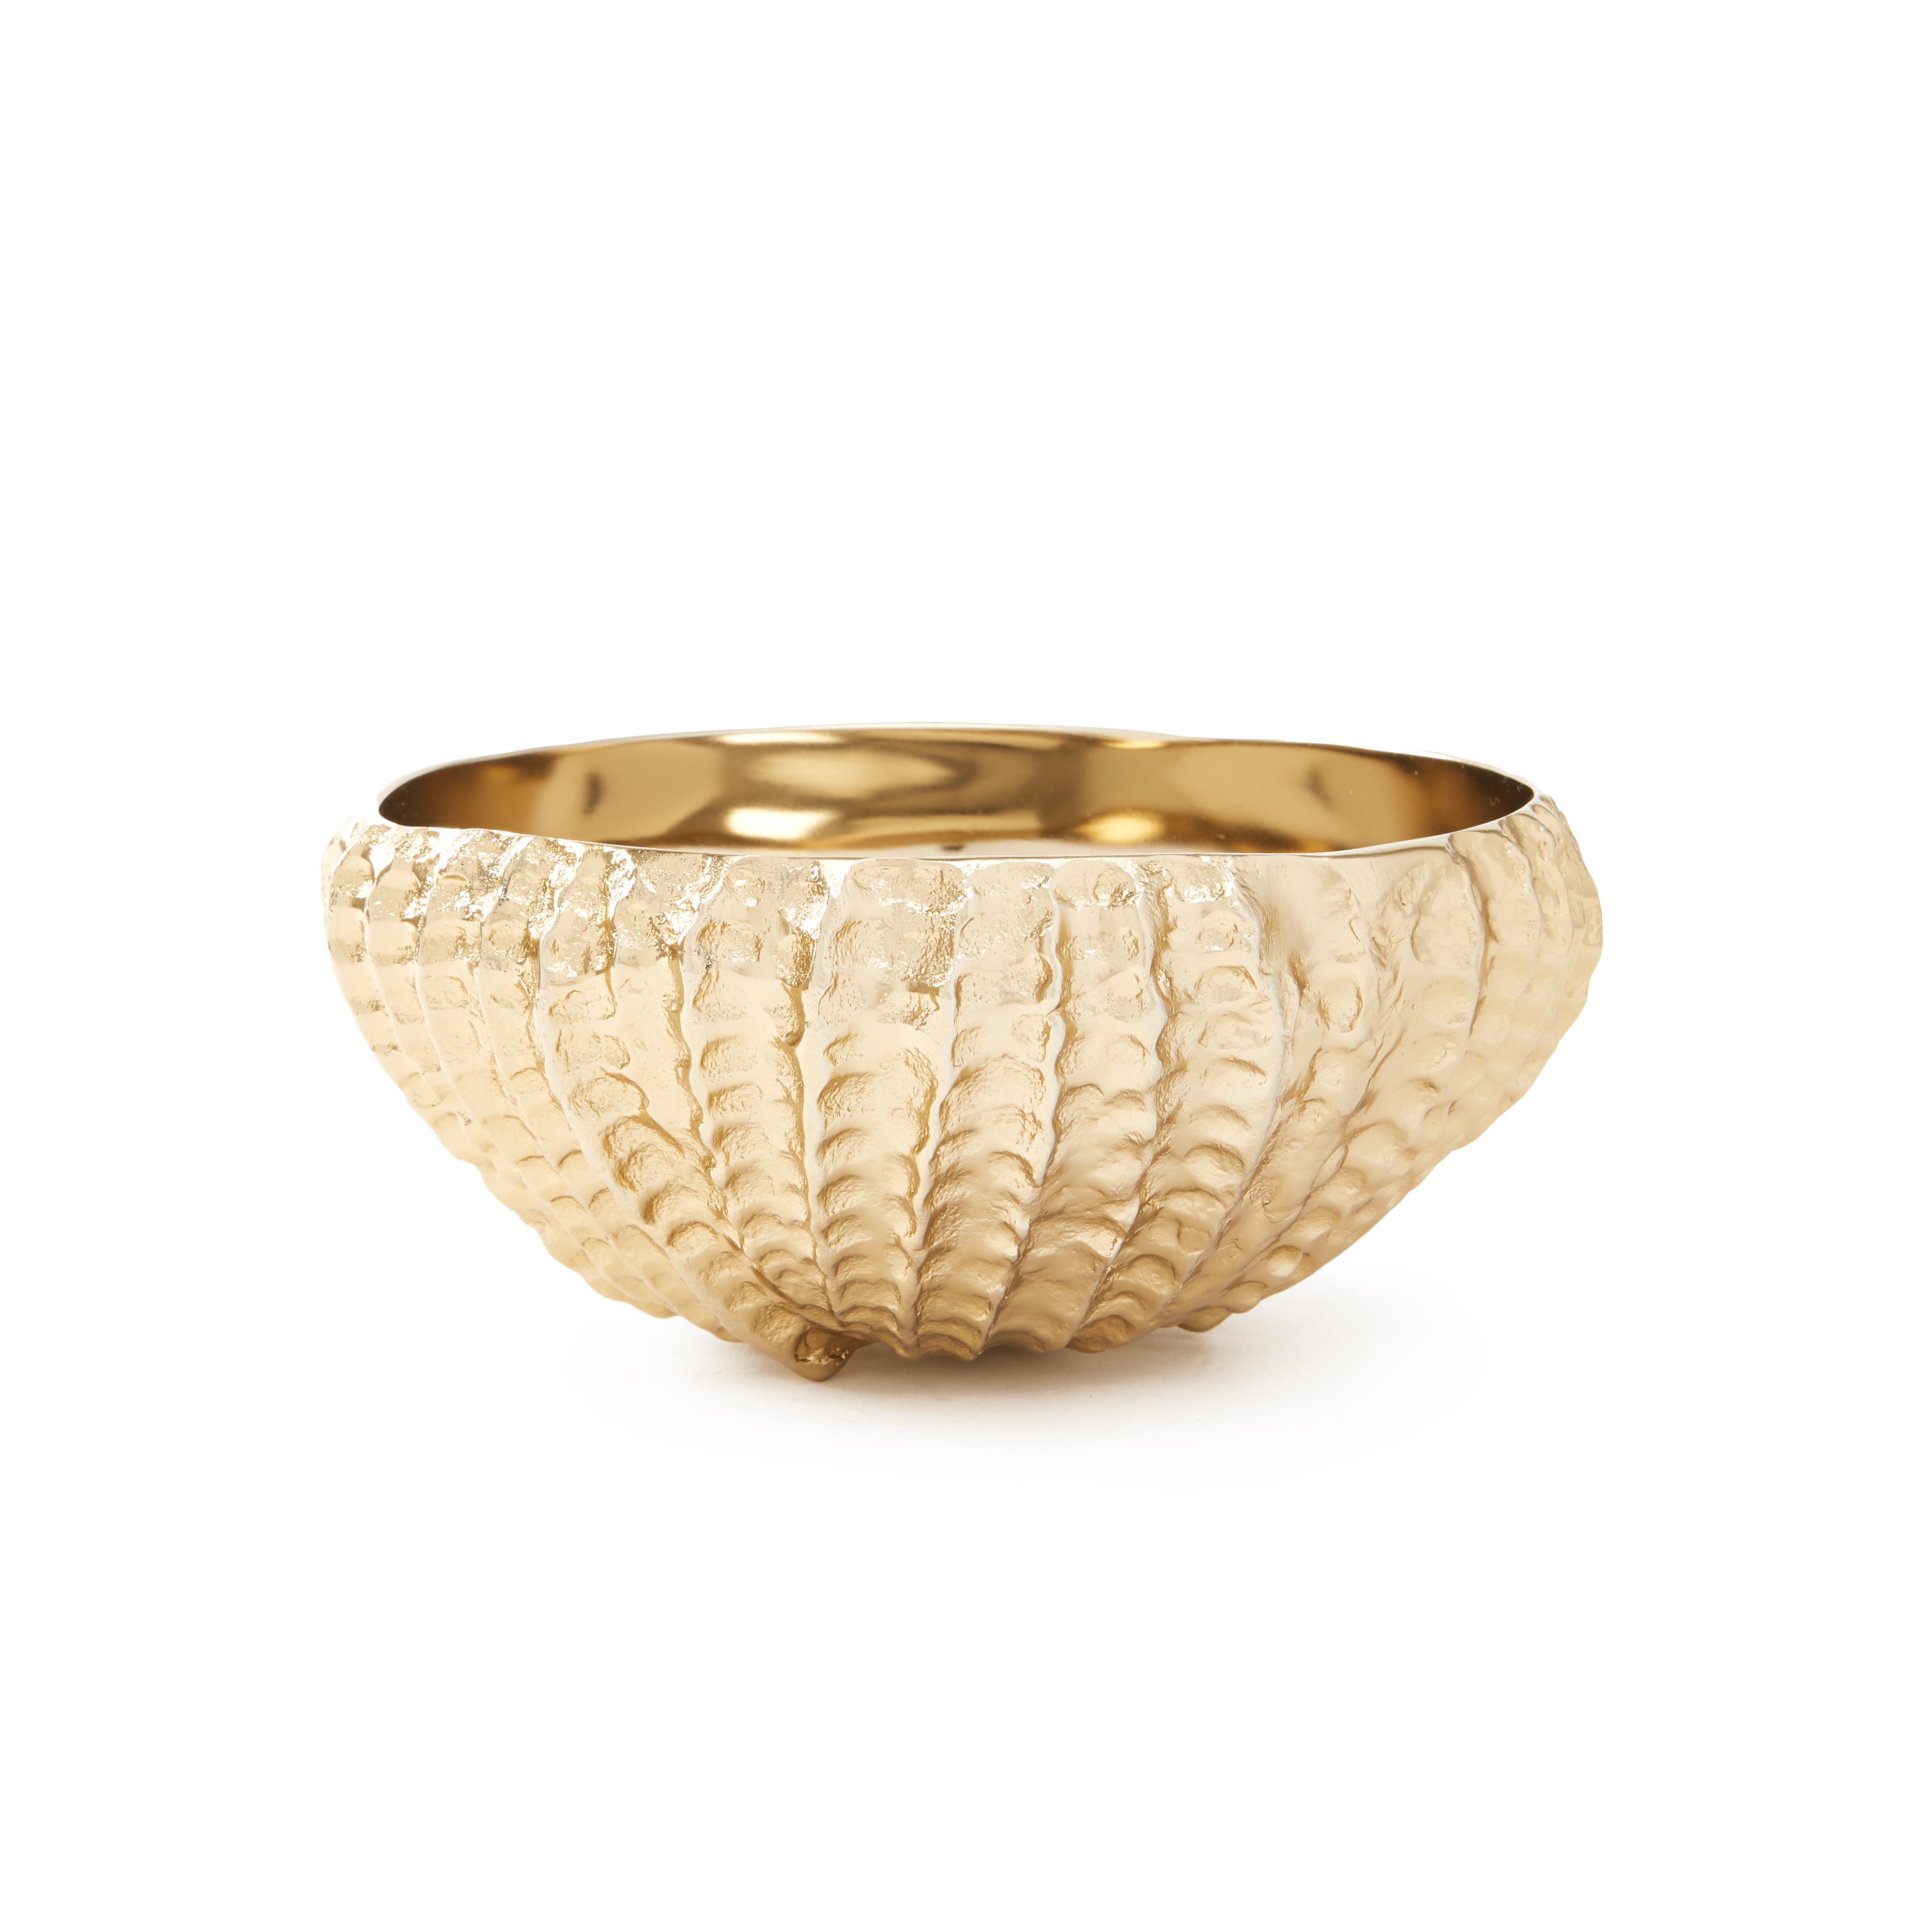 Bungalow 5 Palau bowl